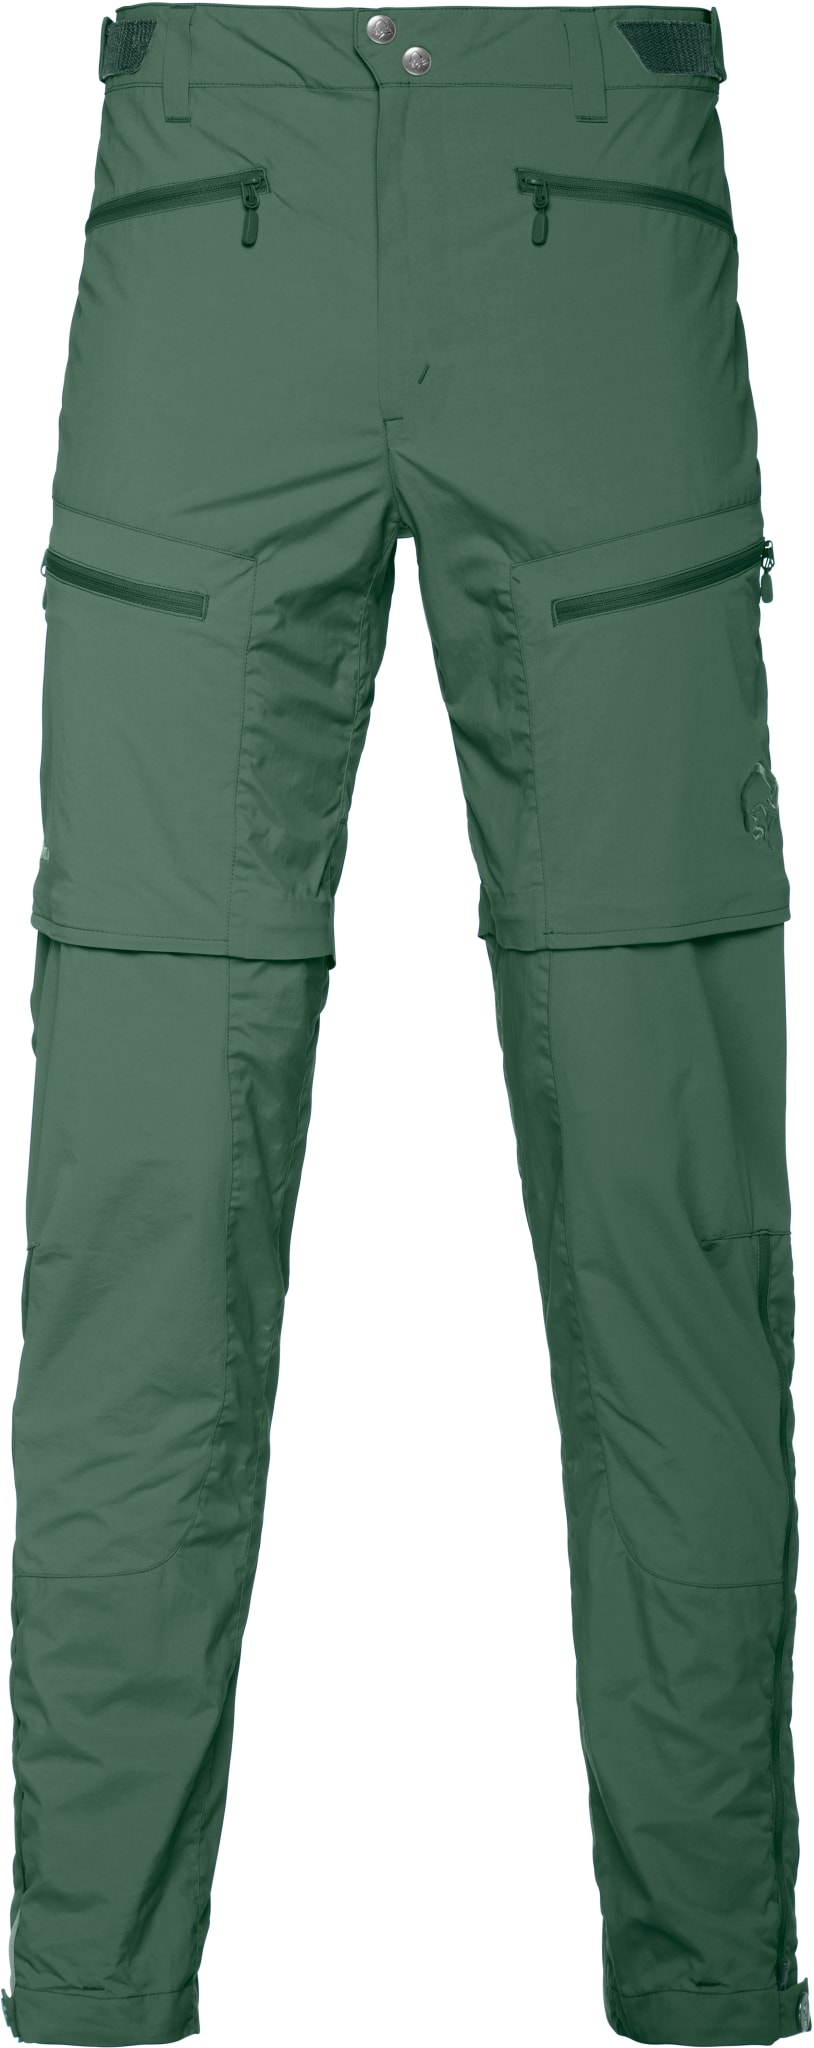 Bitihorn Zip Off Pants M